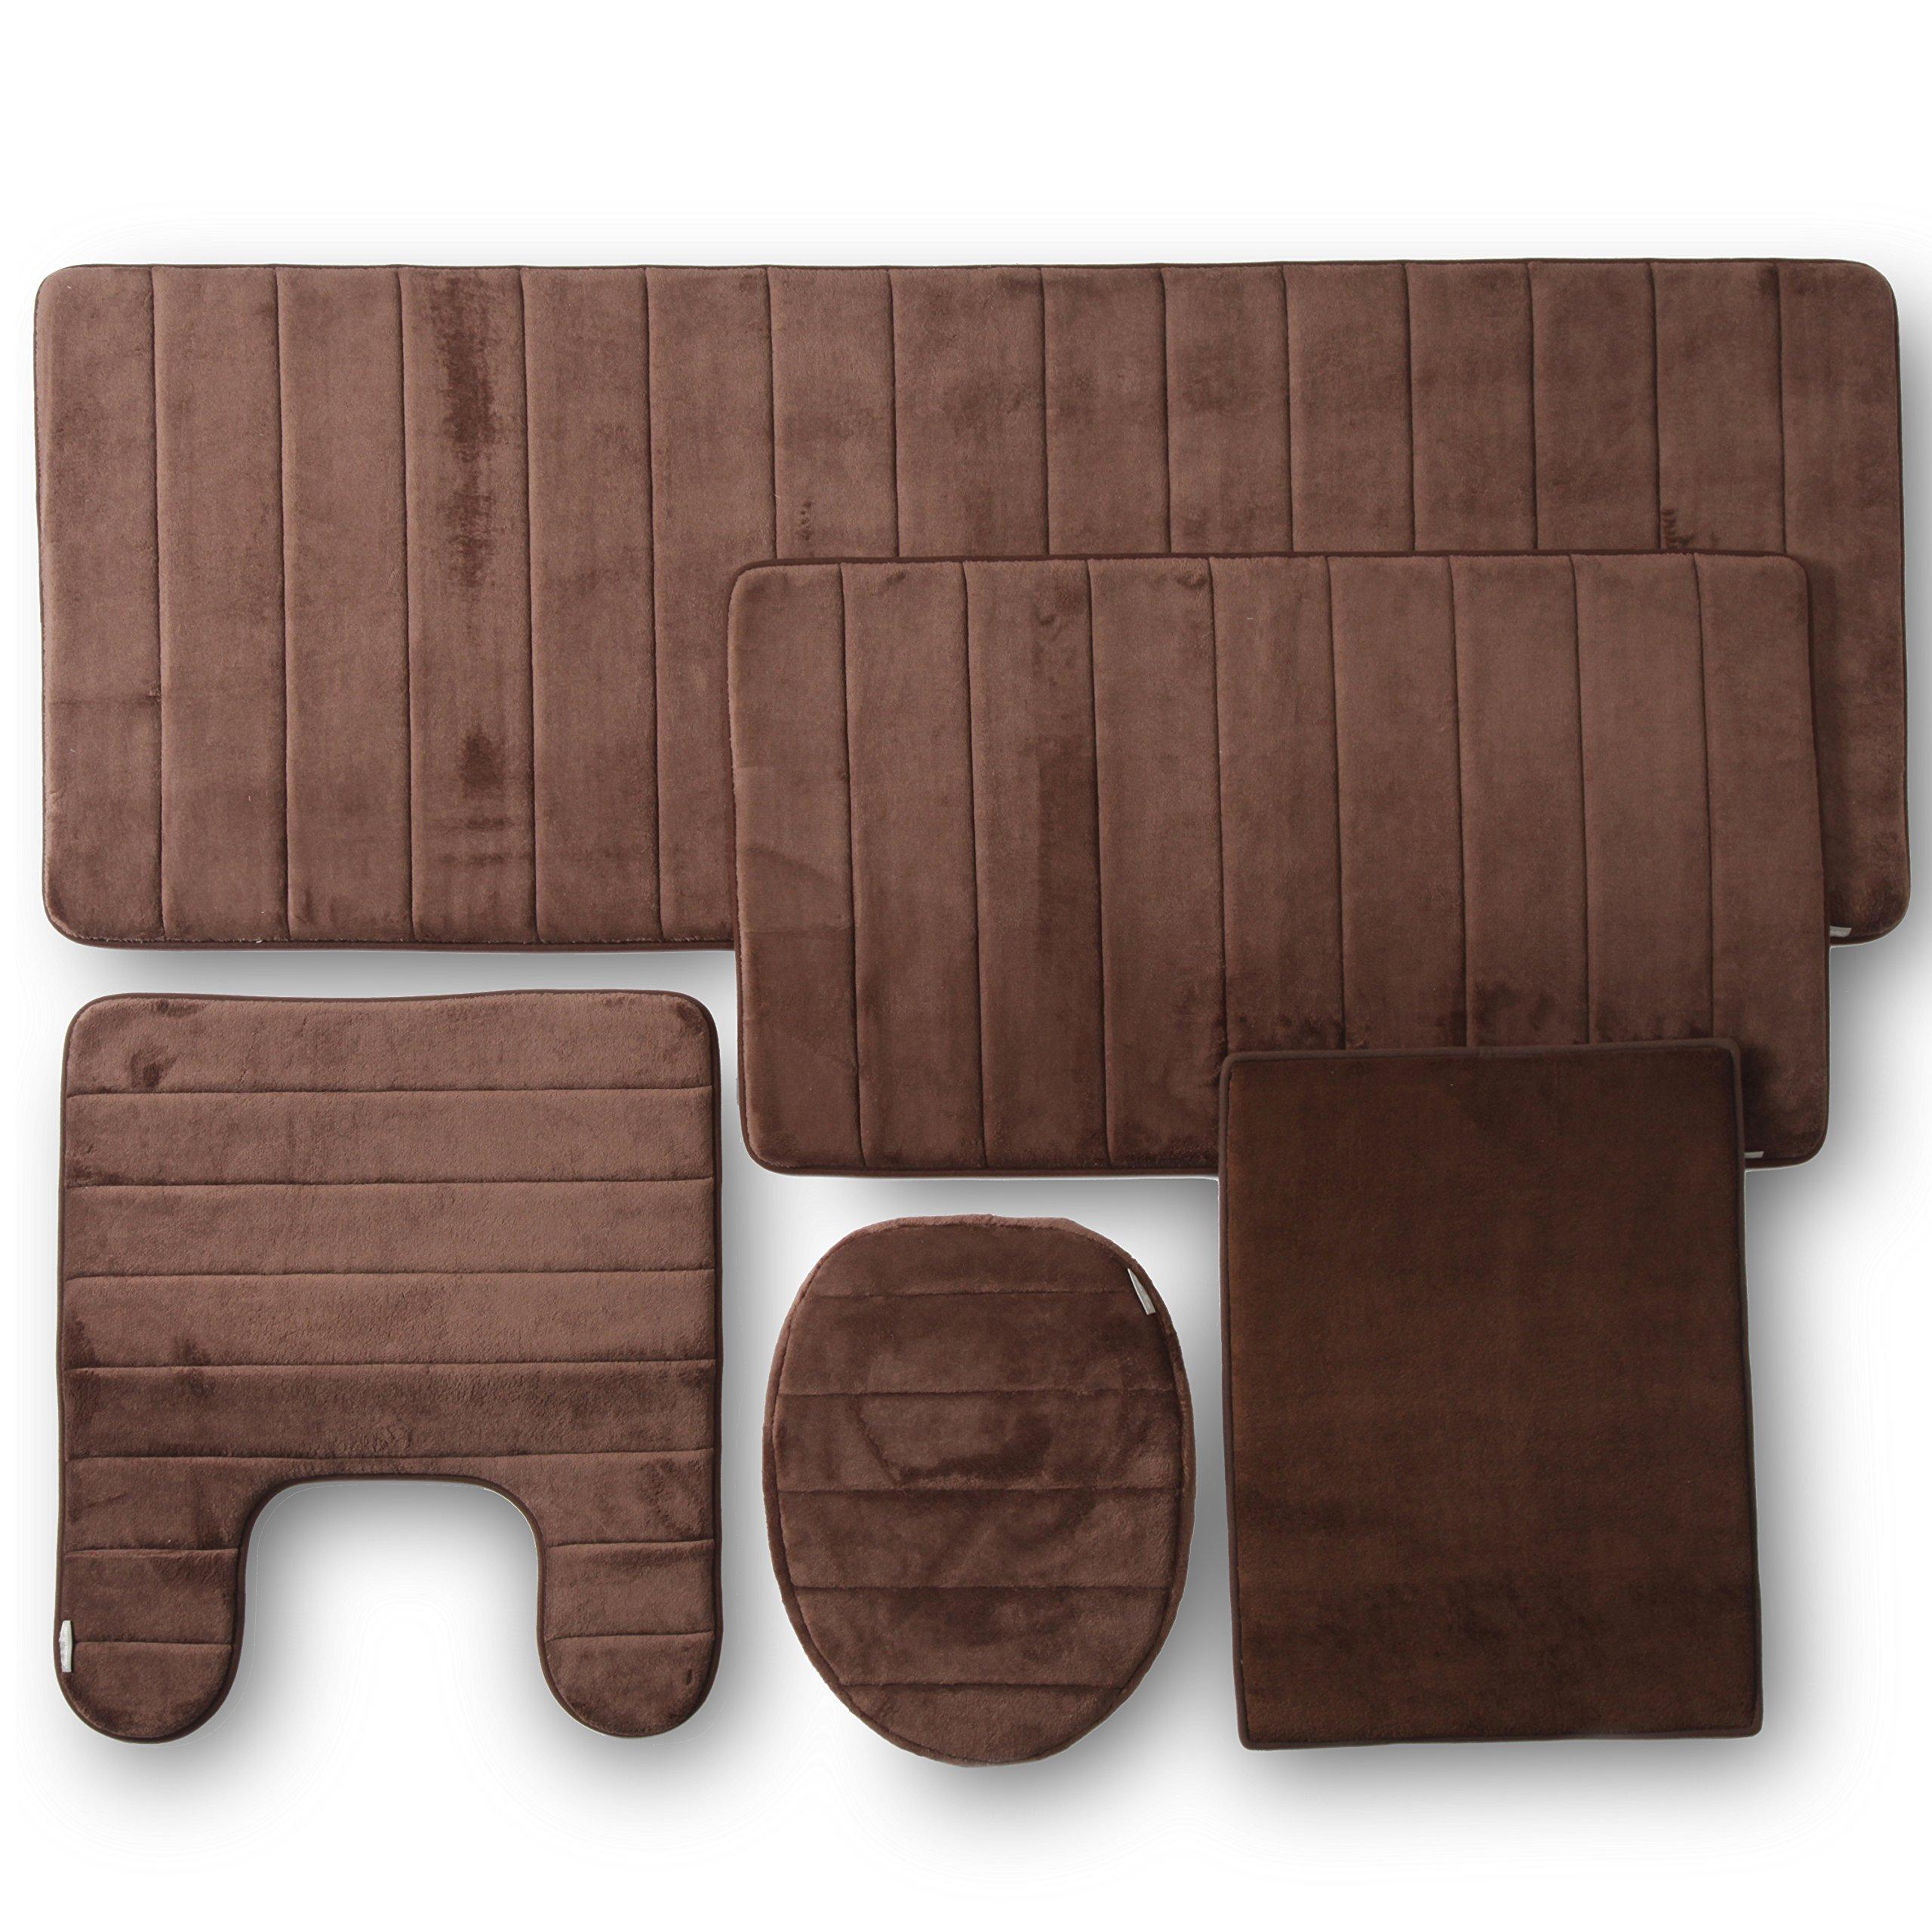 Townhouse Rugs Memory Foam Bathroom Set Combo, 5 Piece, Brown